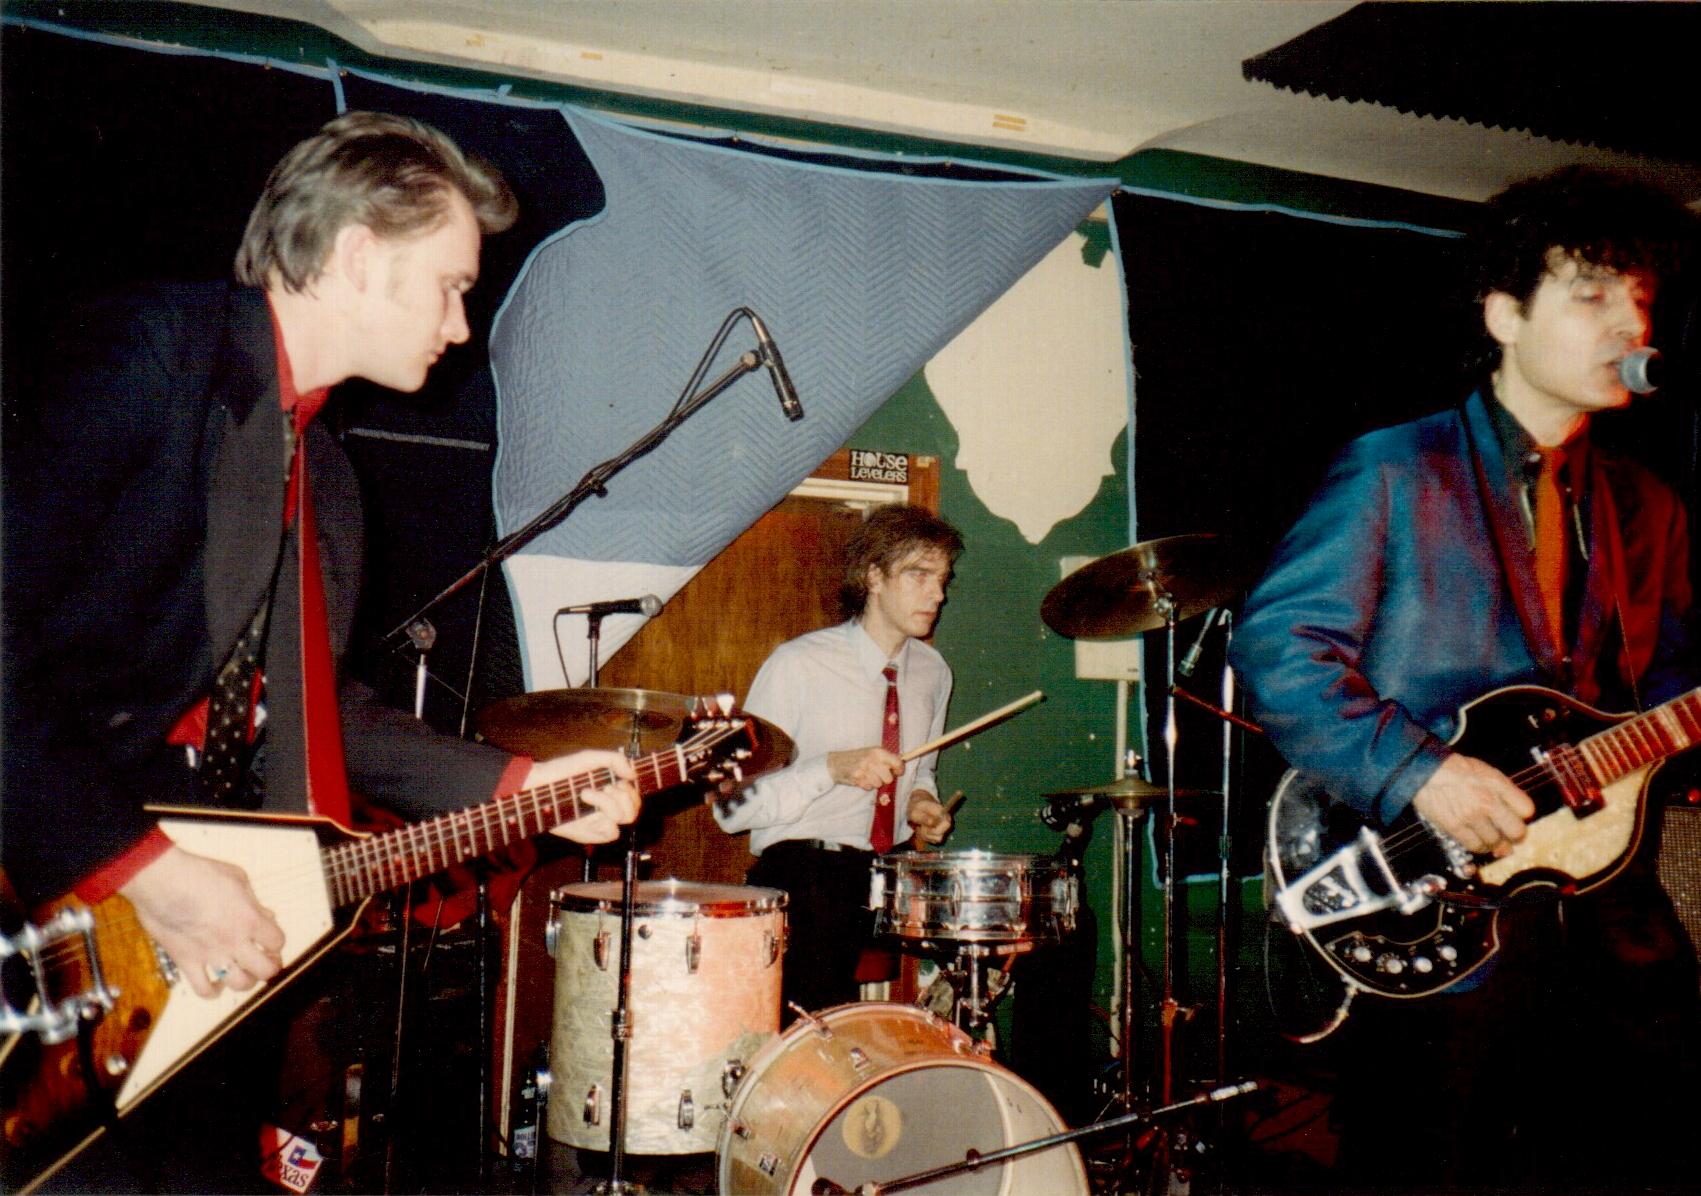 Tav Falco at Muddy Waters Panther Burns 1993